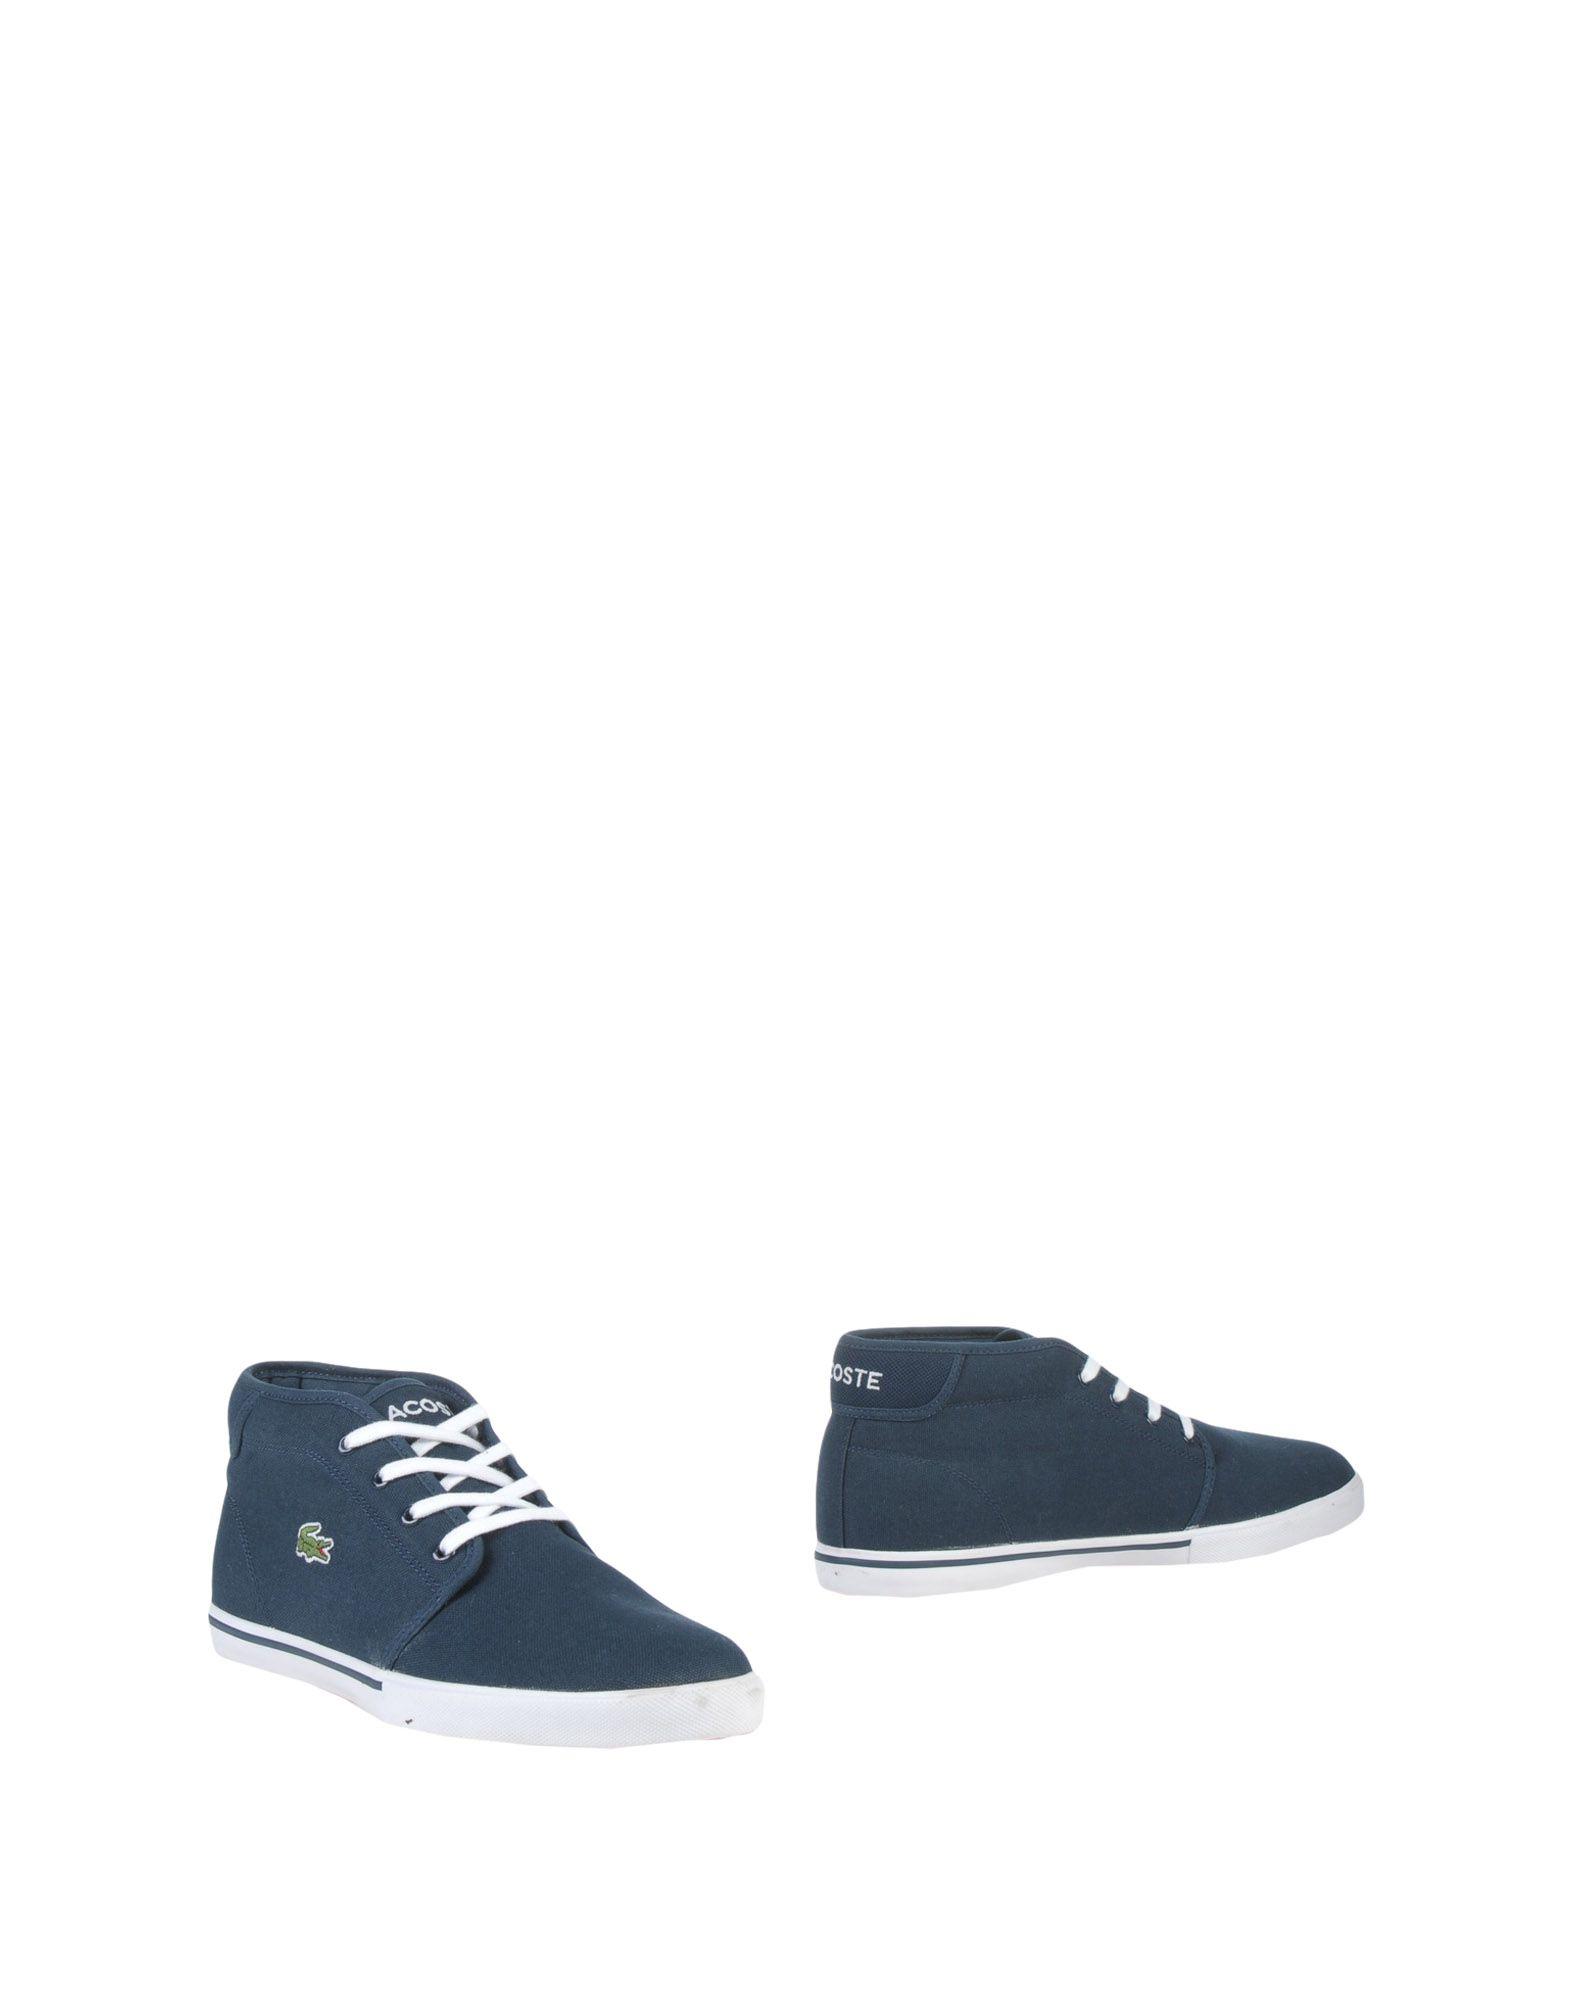 Lacoste Boots - Men Lacoste Boots online on    Canada - 11403135UQ 16b493